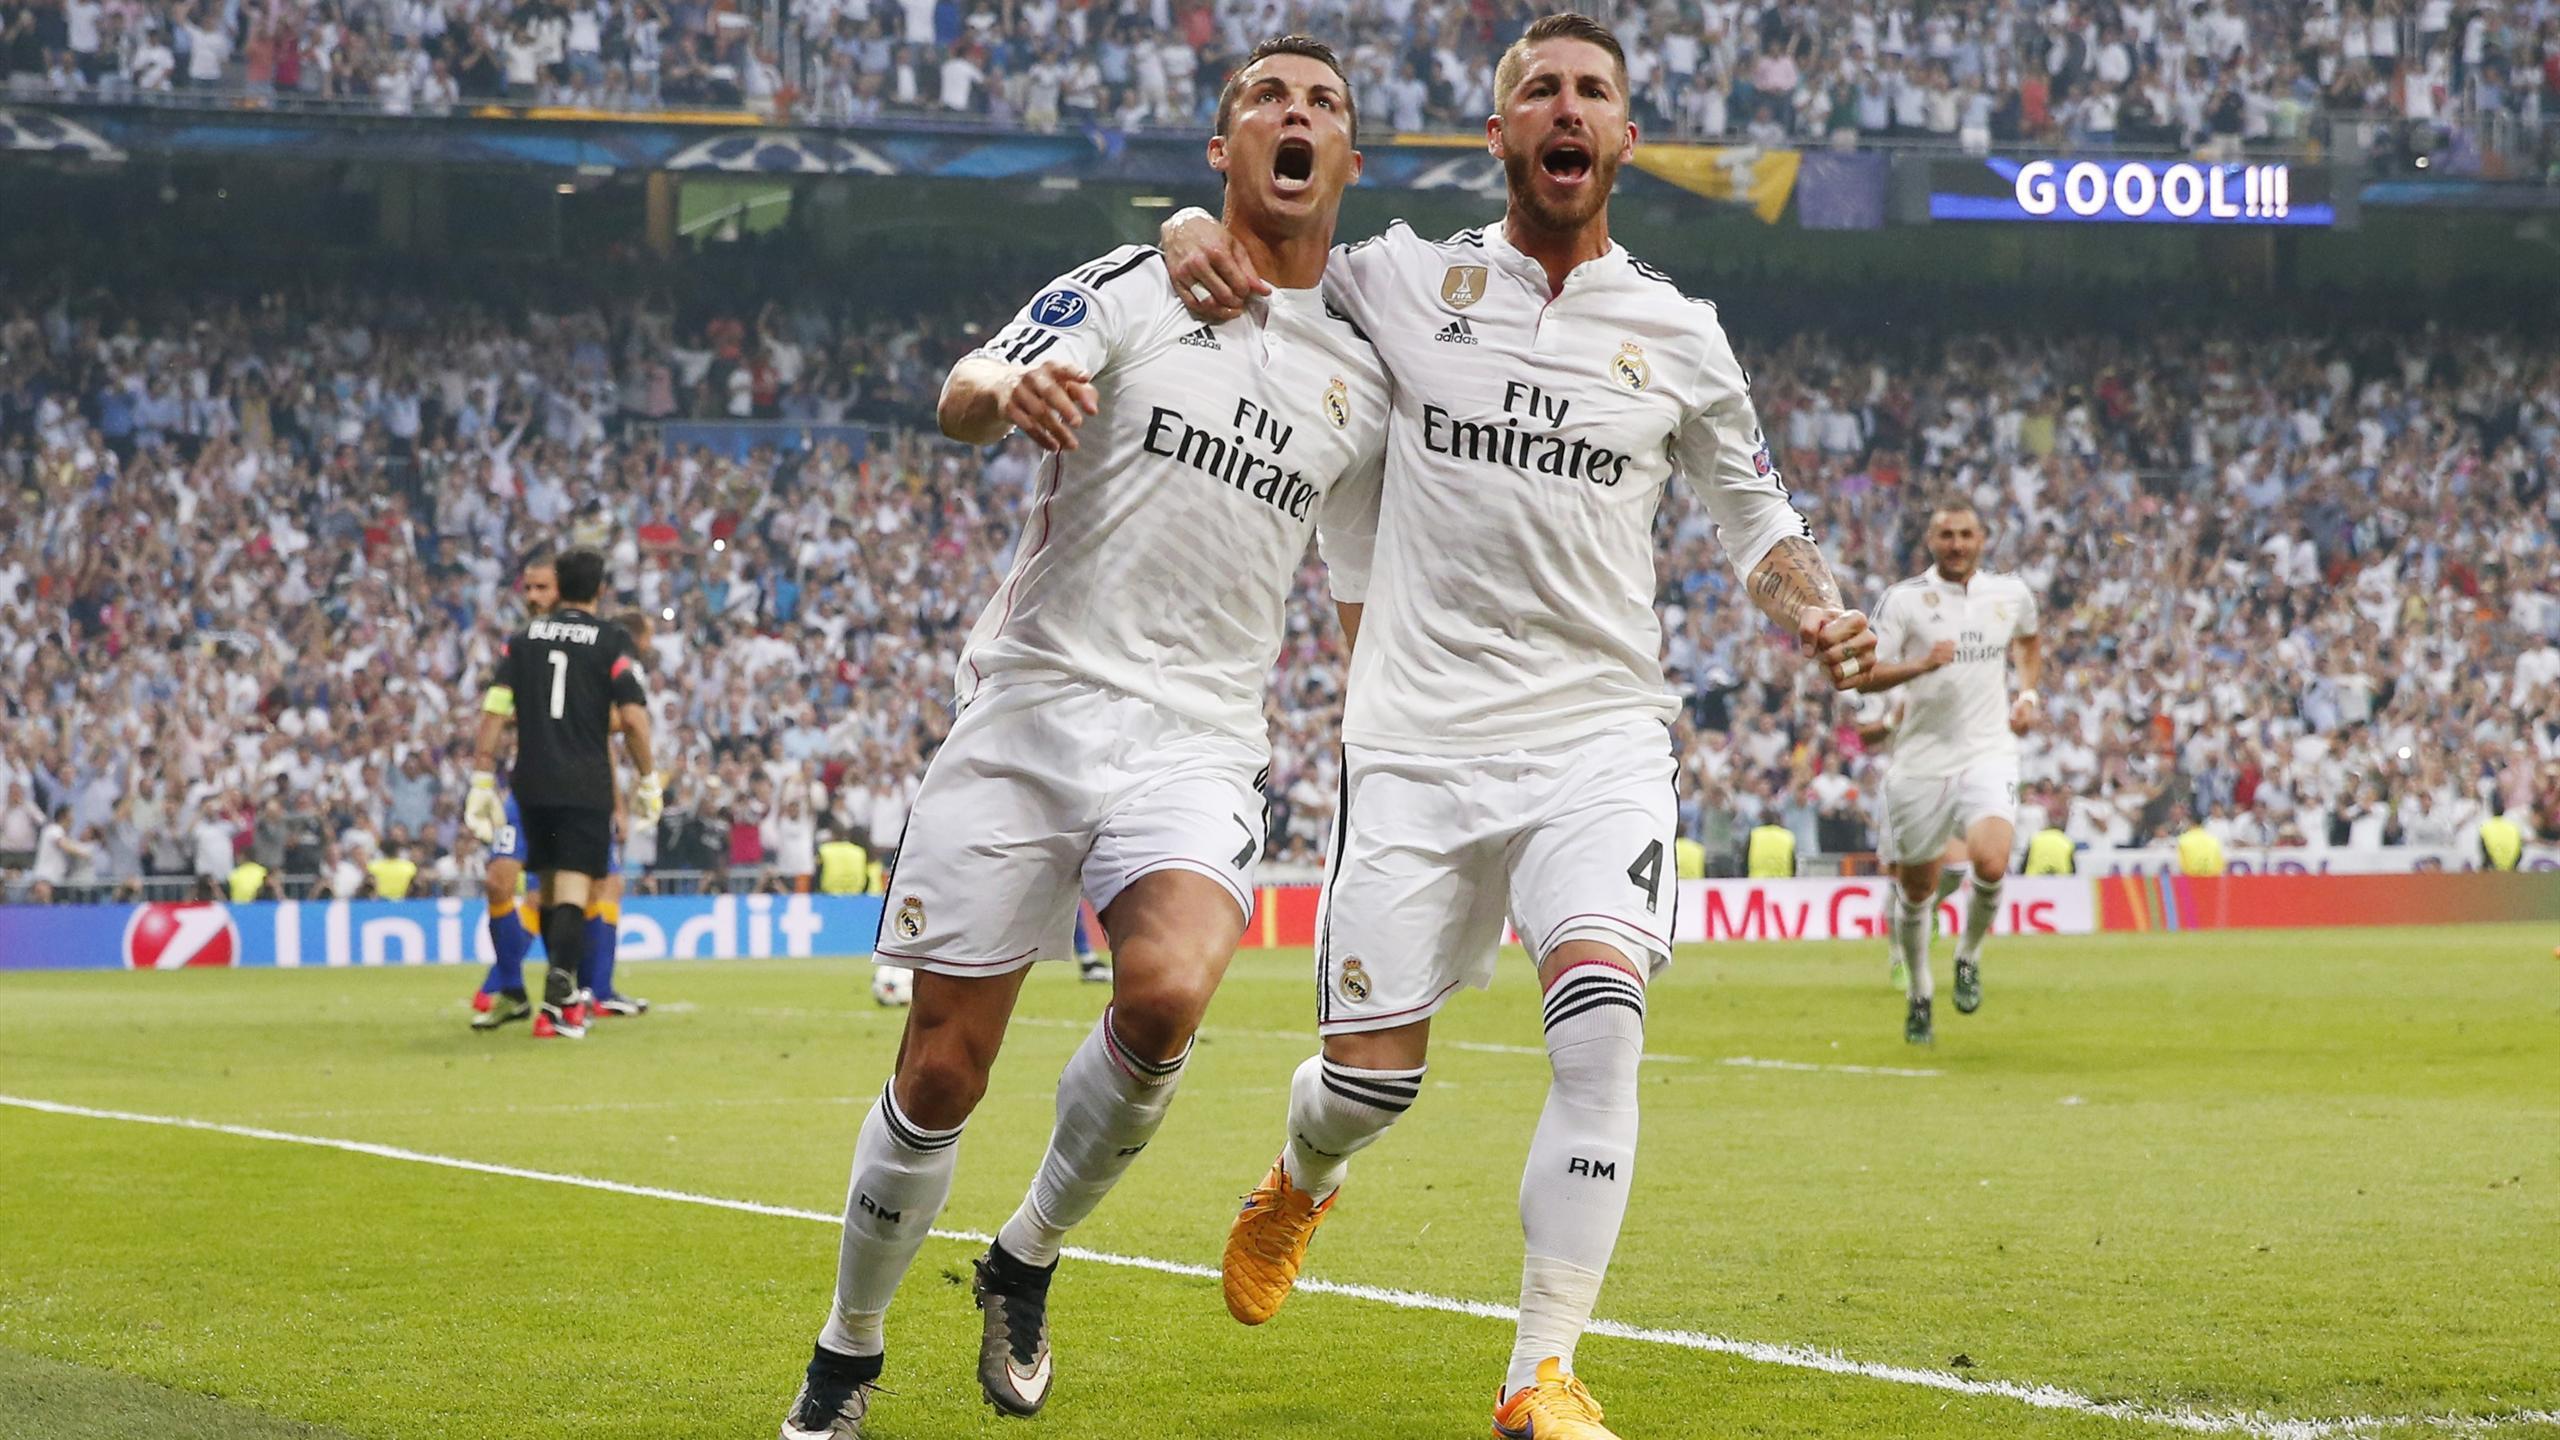 Криштиану Роналду и Серхио Рамос («Реал Мадрид»)